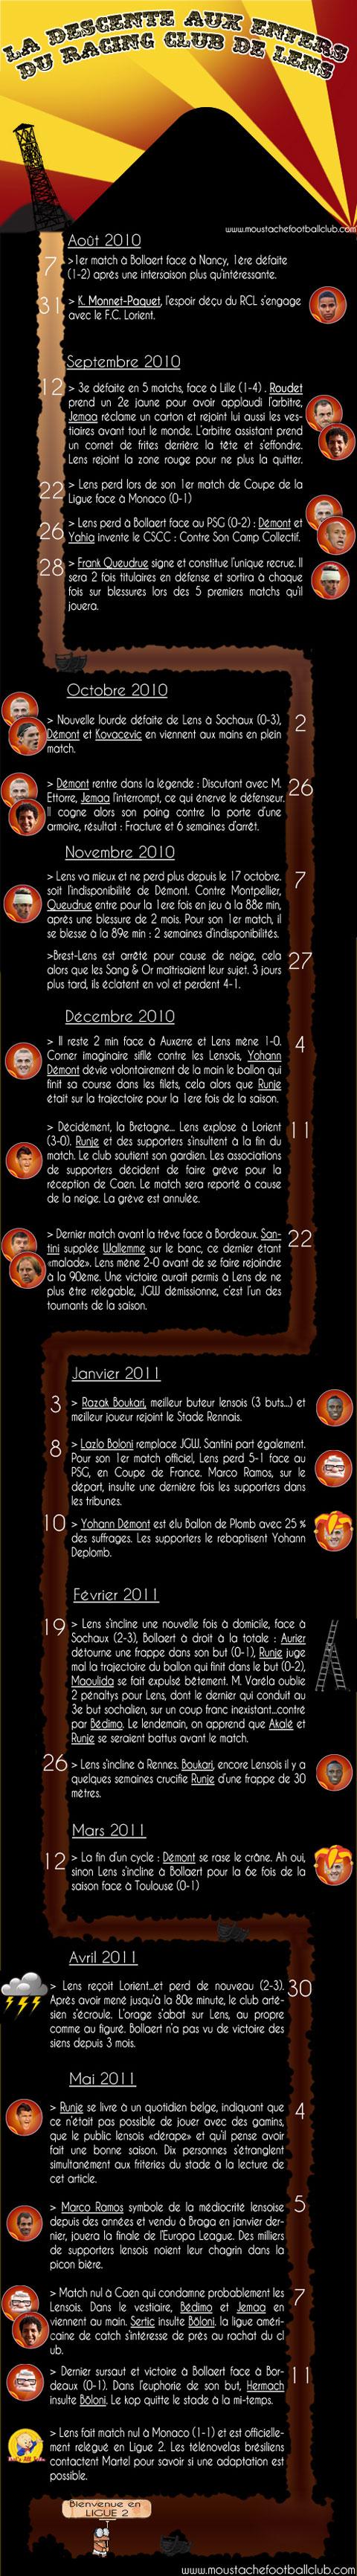 infographie_lens_moustache_fc.jpg